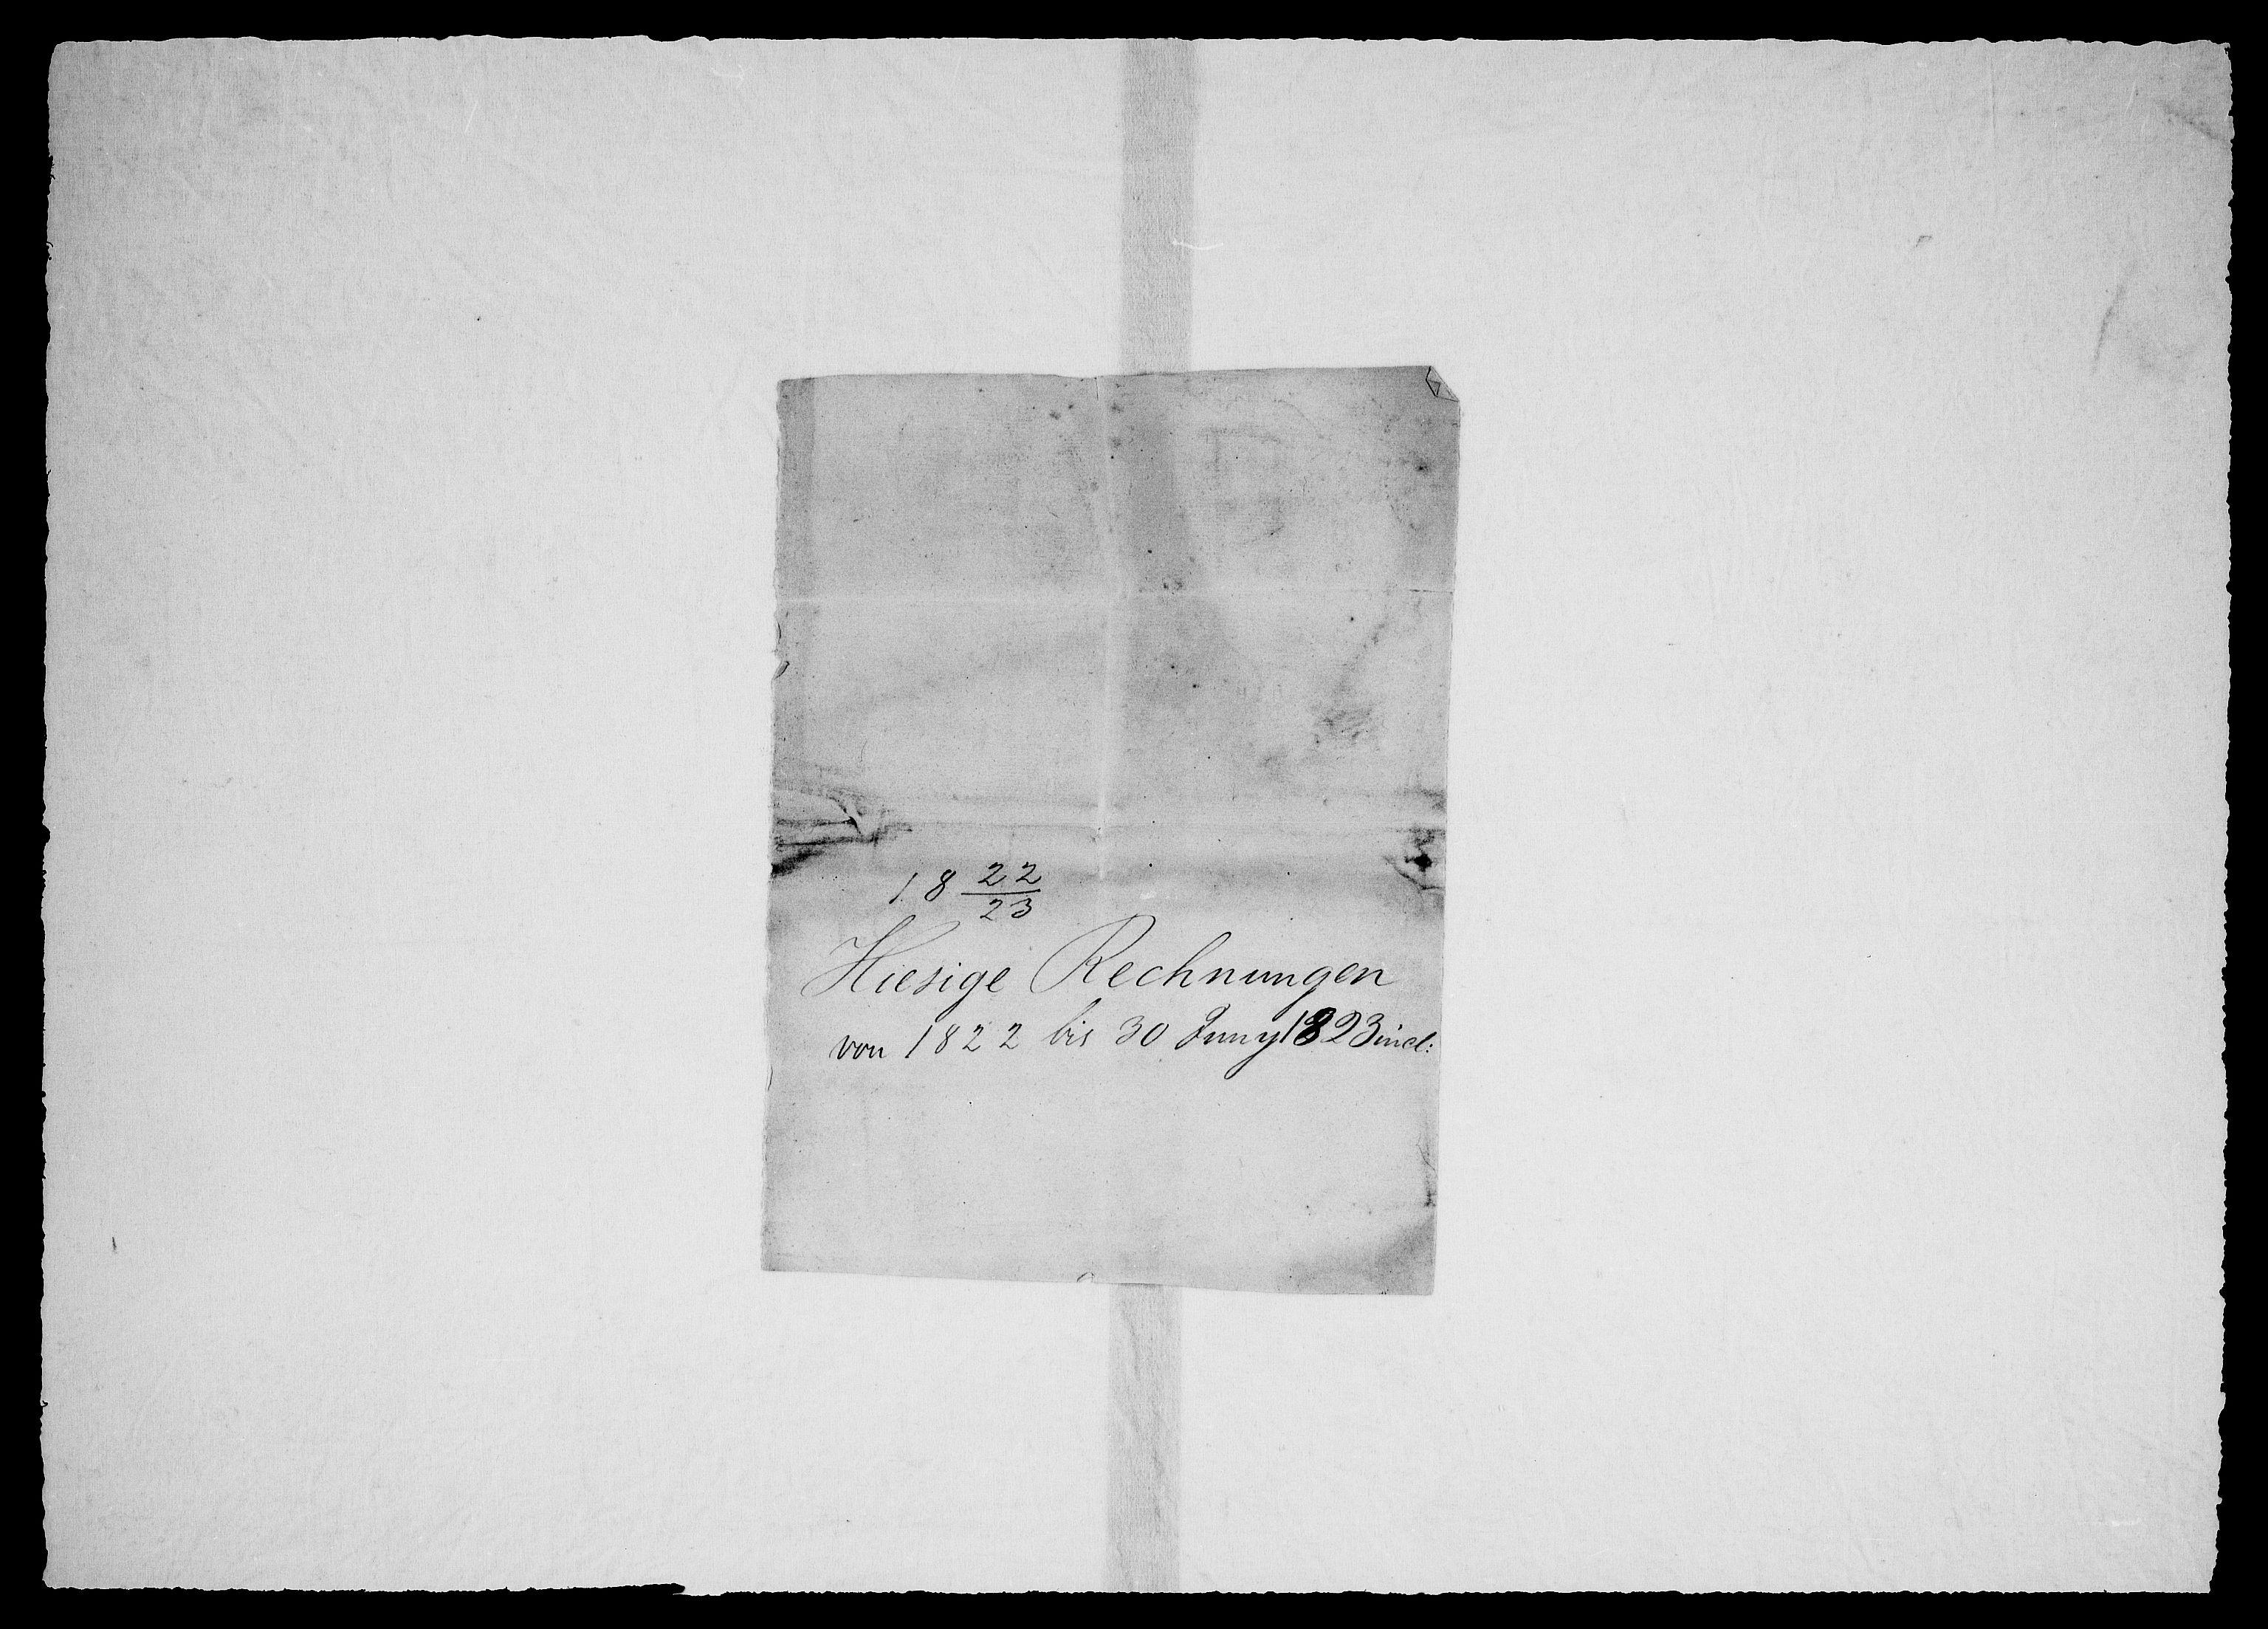 RA, Modums Blaafarveværk, G/Gd/Gdc/L0214, 1822-1825, s. 2